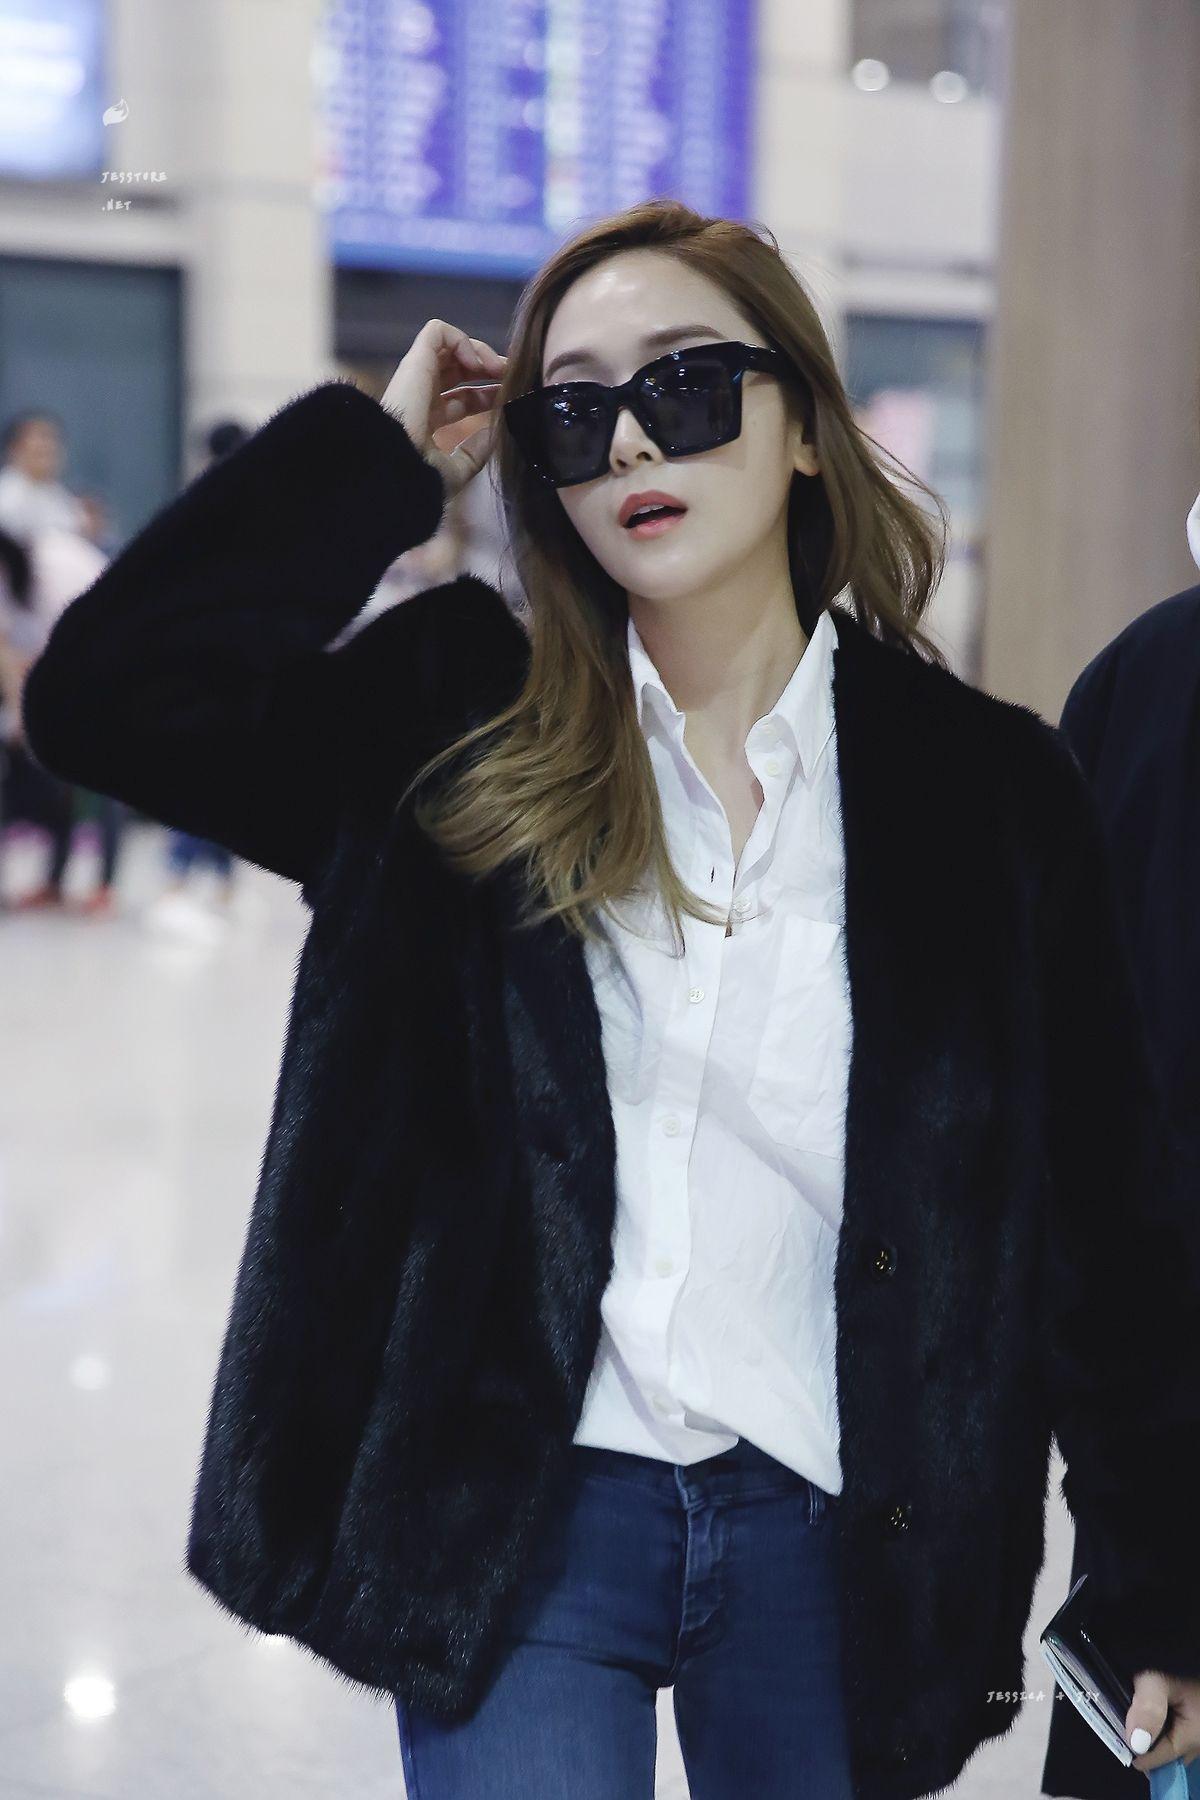 Jessica Jung Airport Fashion 170215 2017 Snsd Airport Fashion Pinterest Jessica Jung